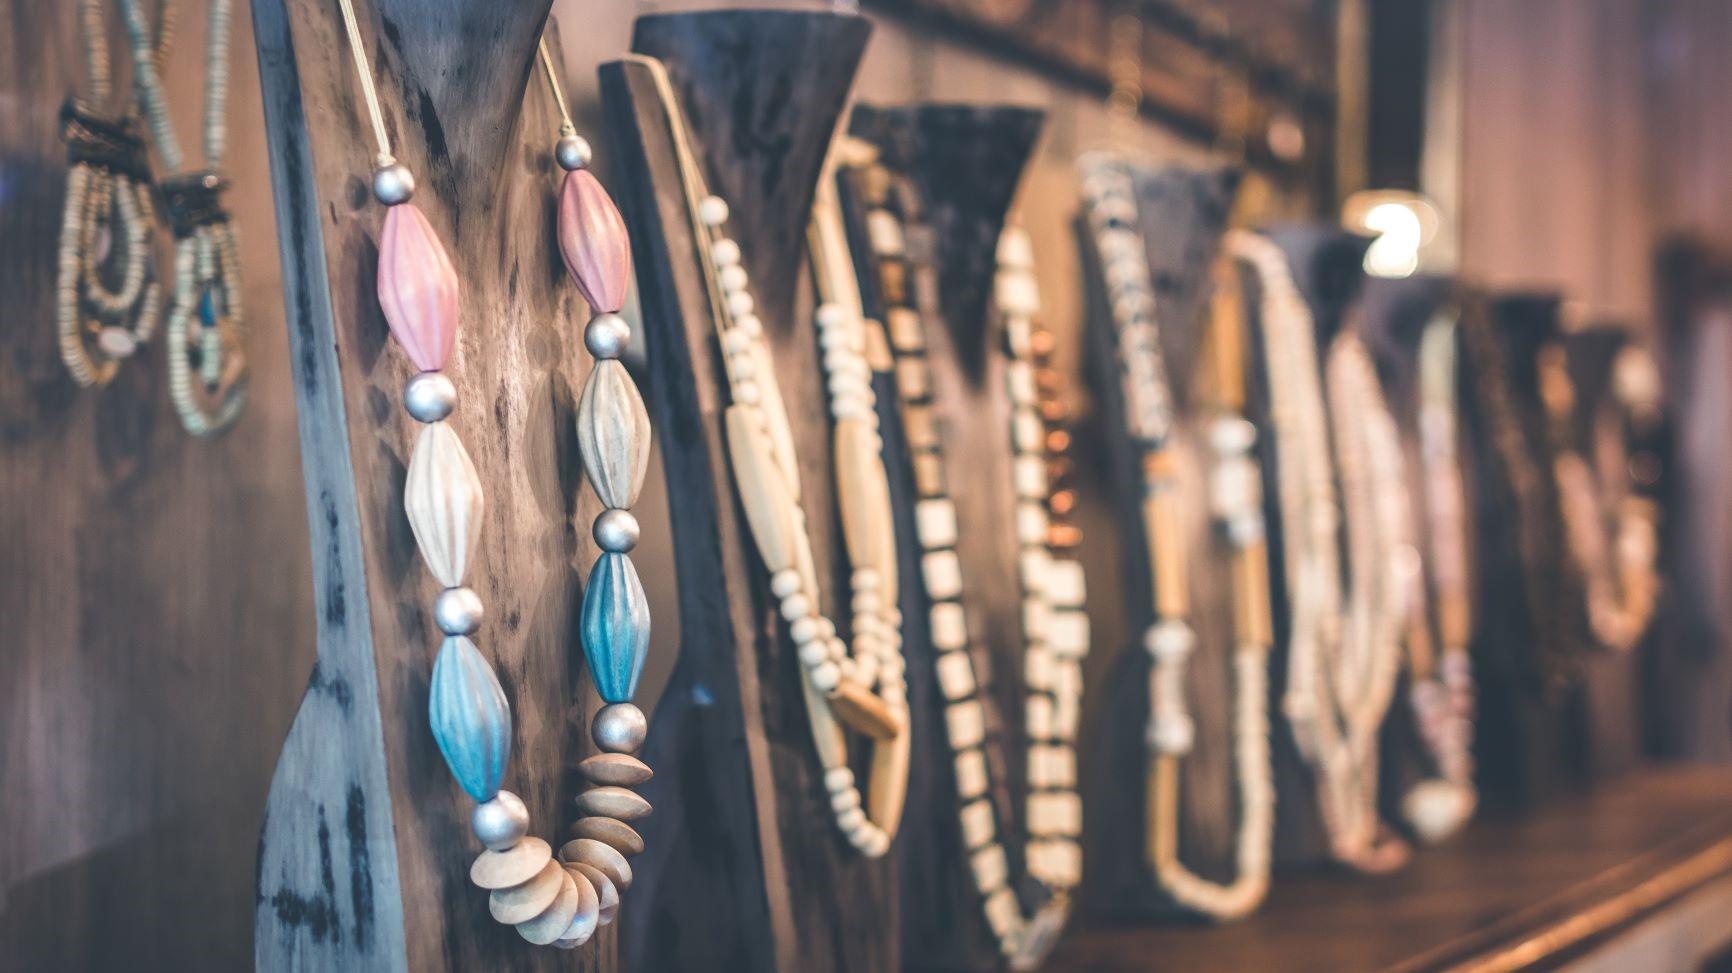 Caterham jewellery, Surrey